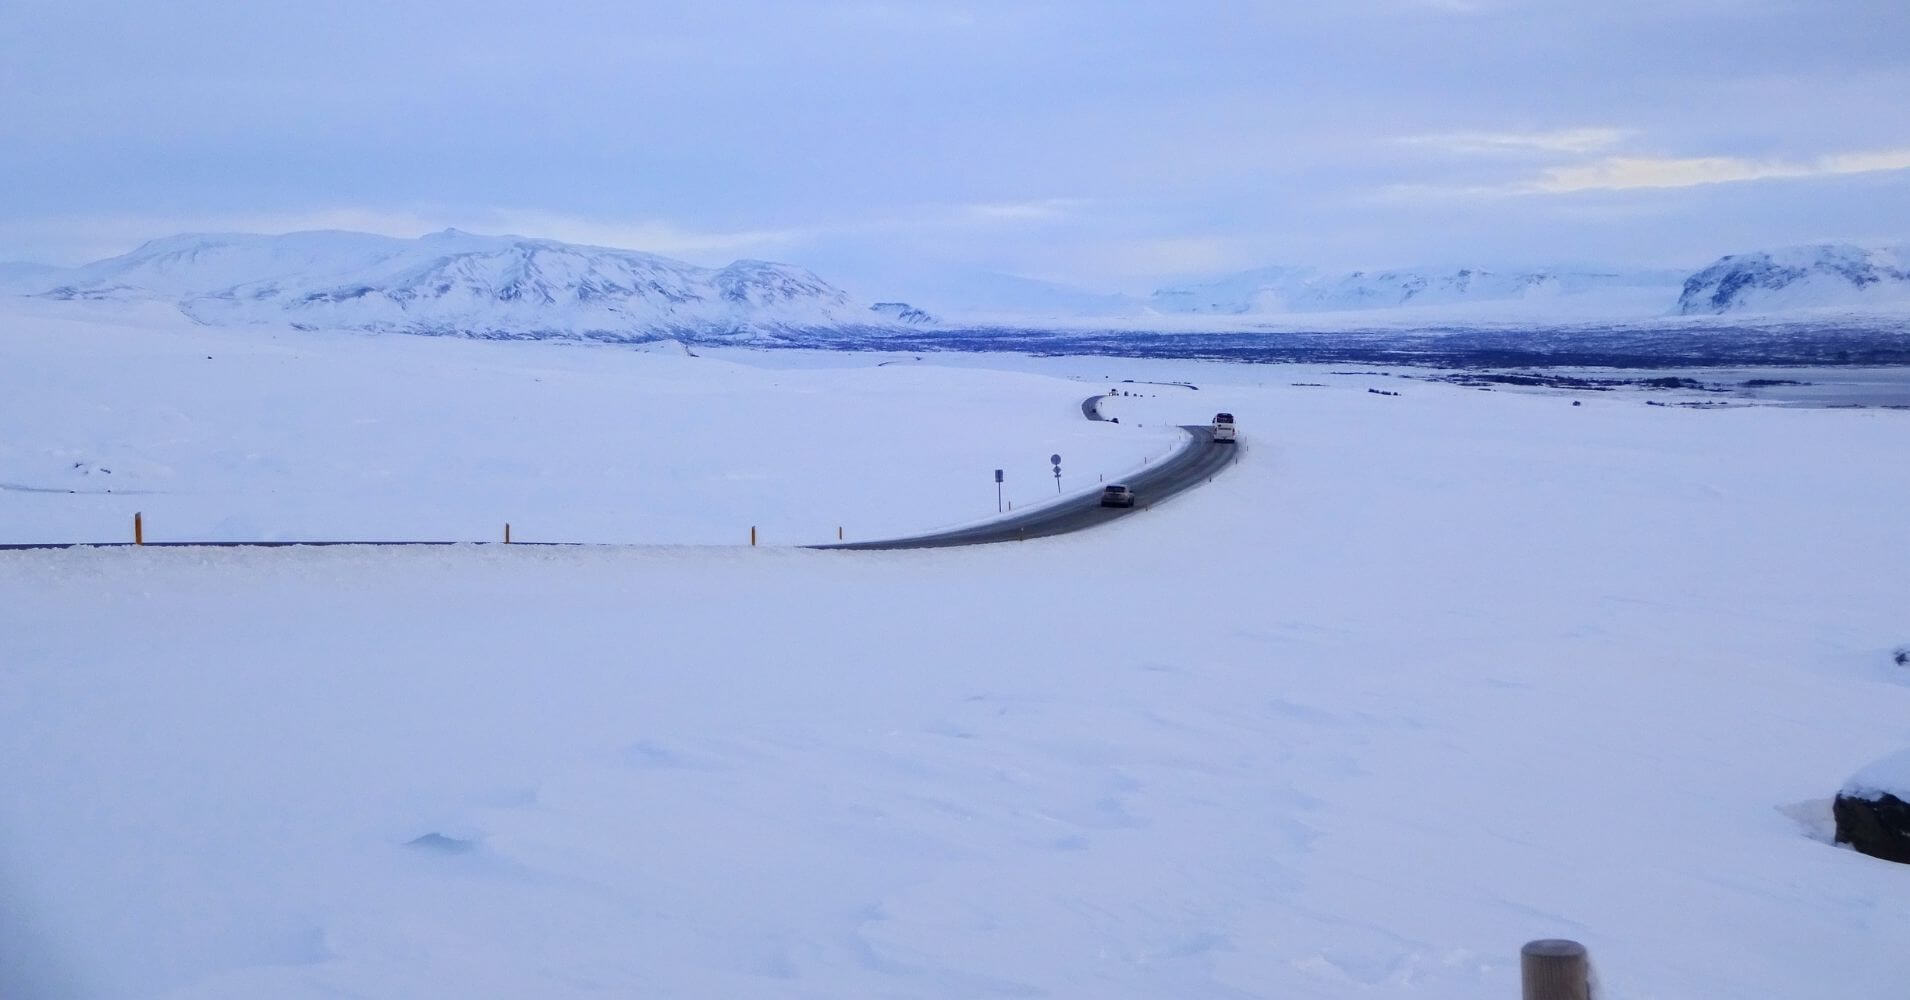 Circulo Dorado, Paisaje islandés invernal.